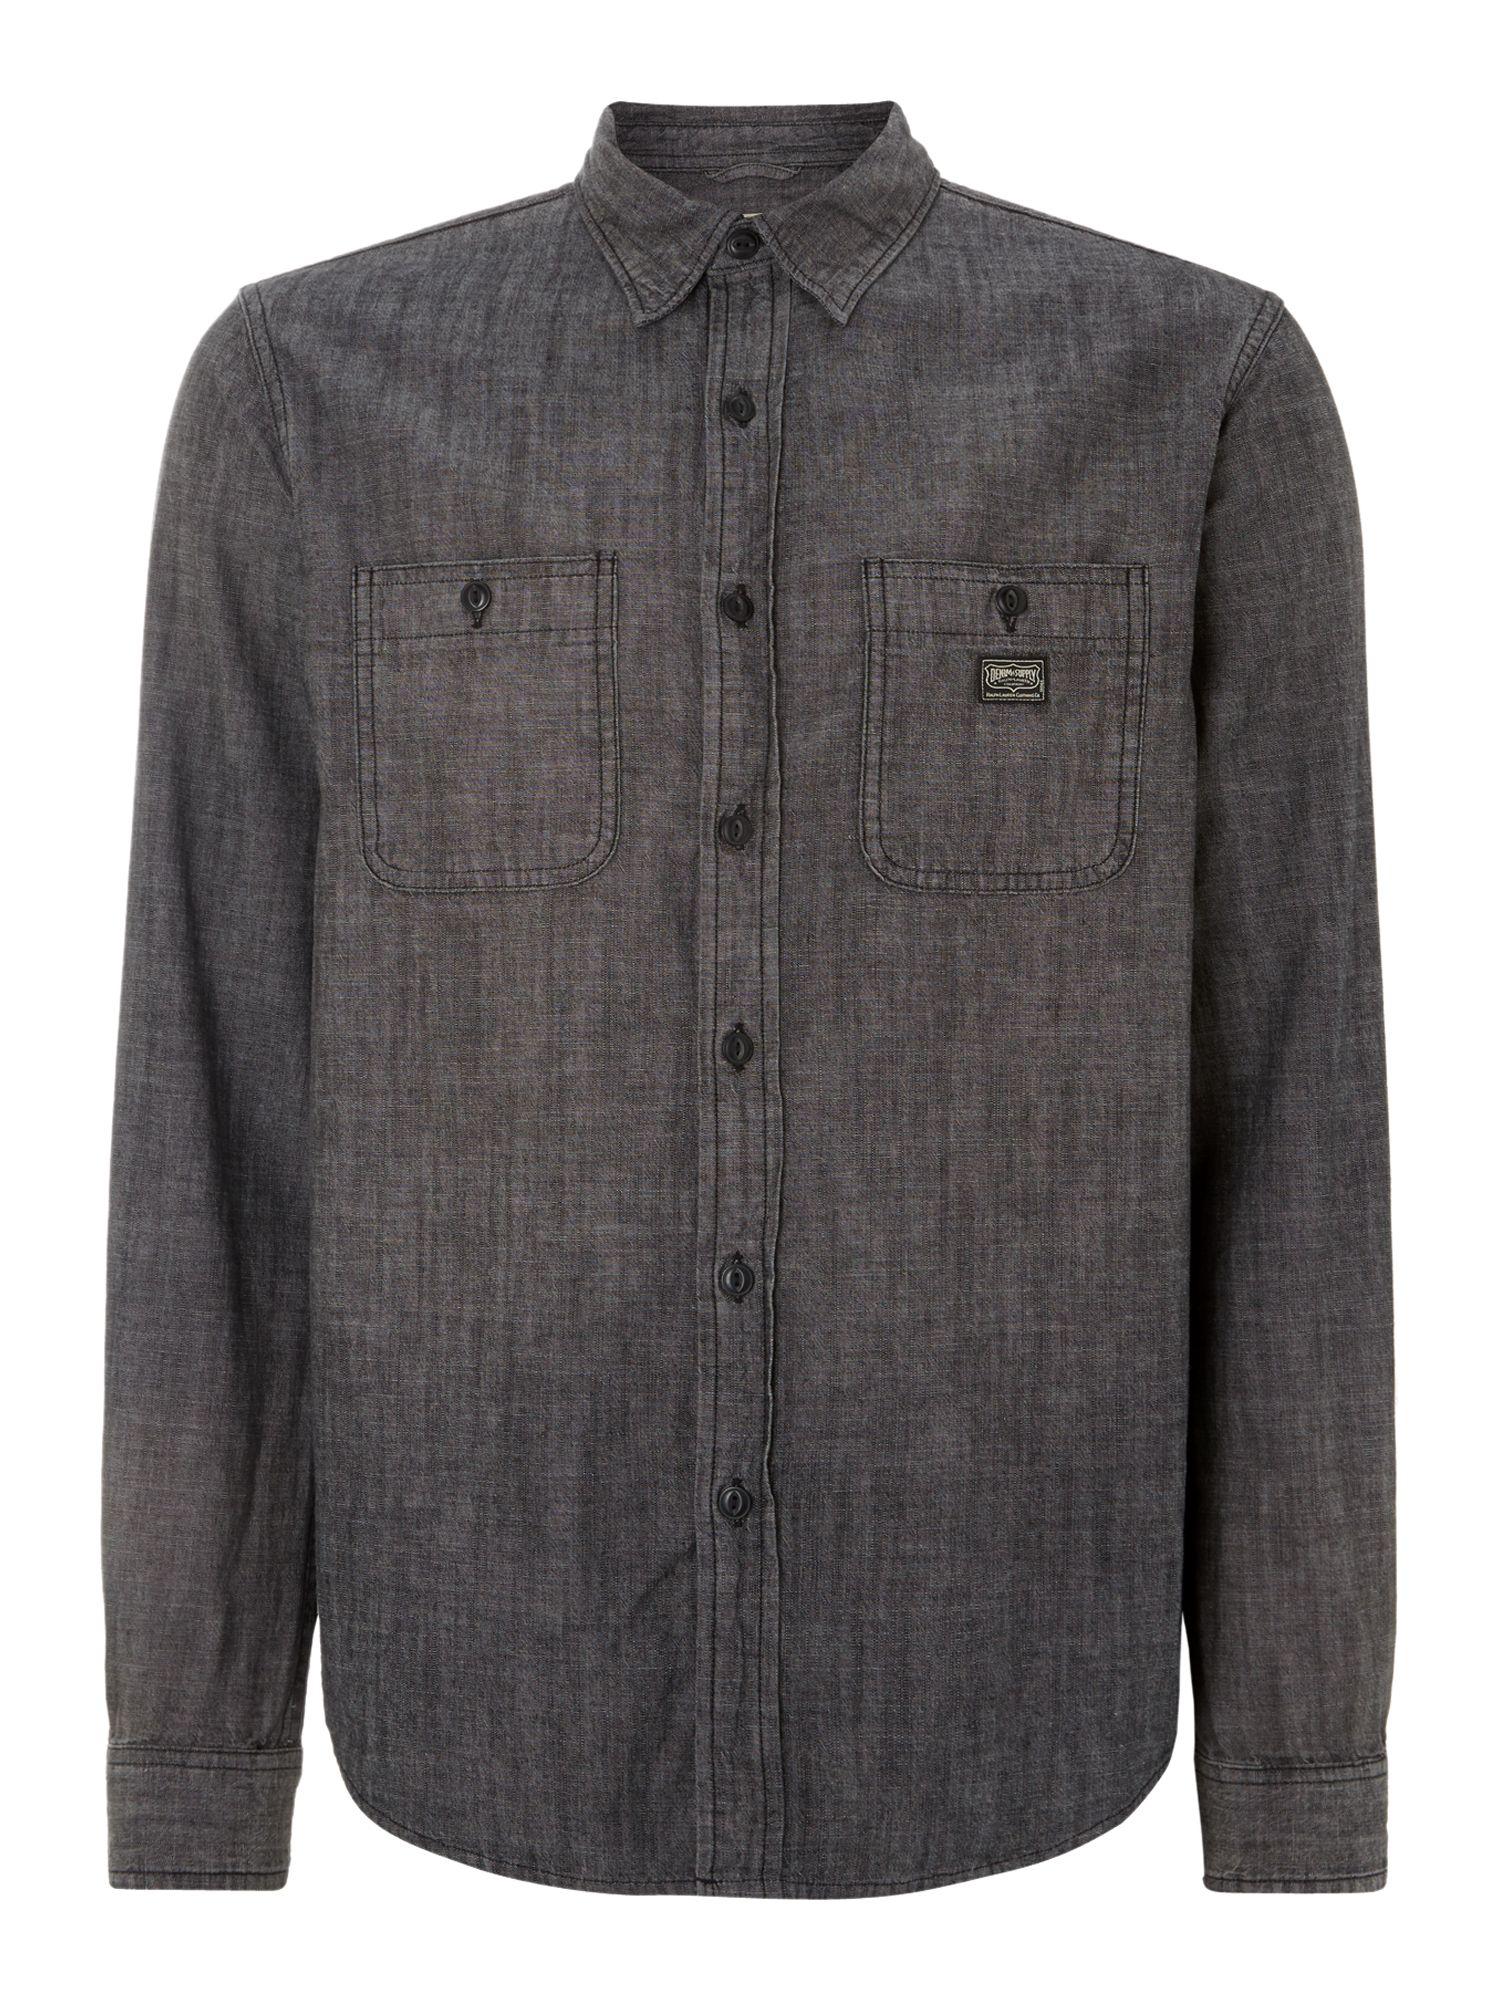 Denim Supply Ralph Lauren Long Sleeve Work Shirt In Gray